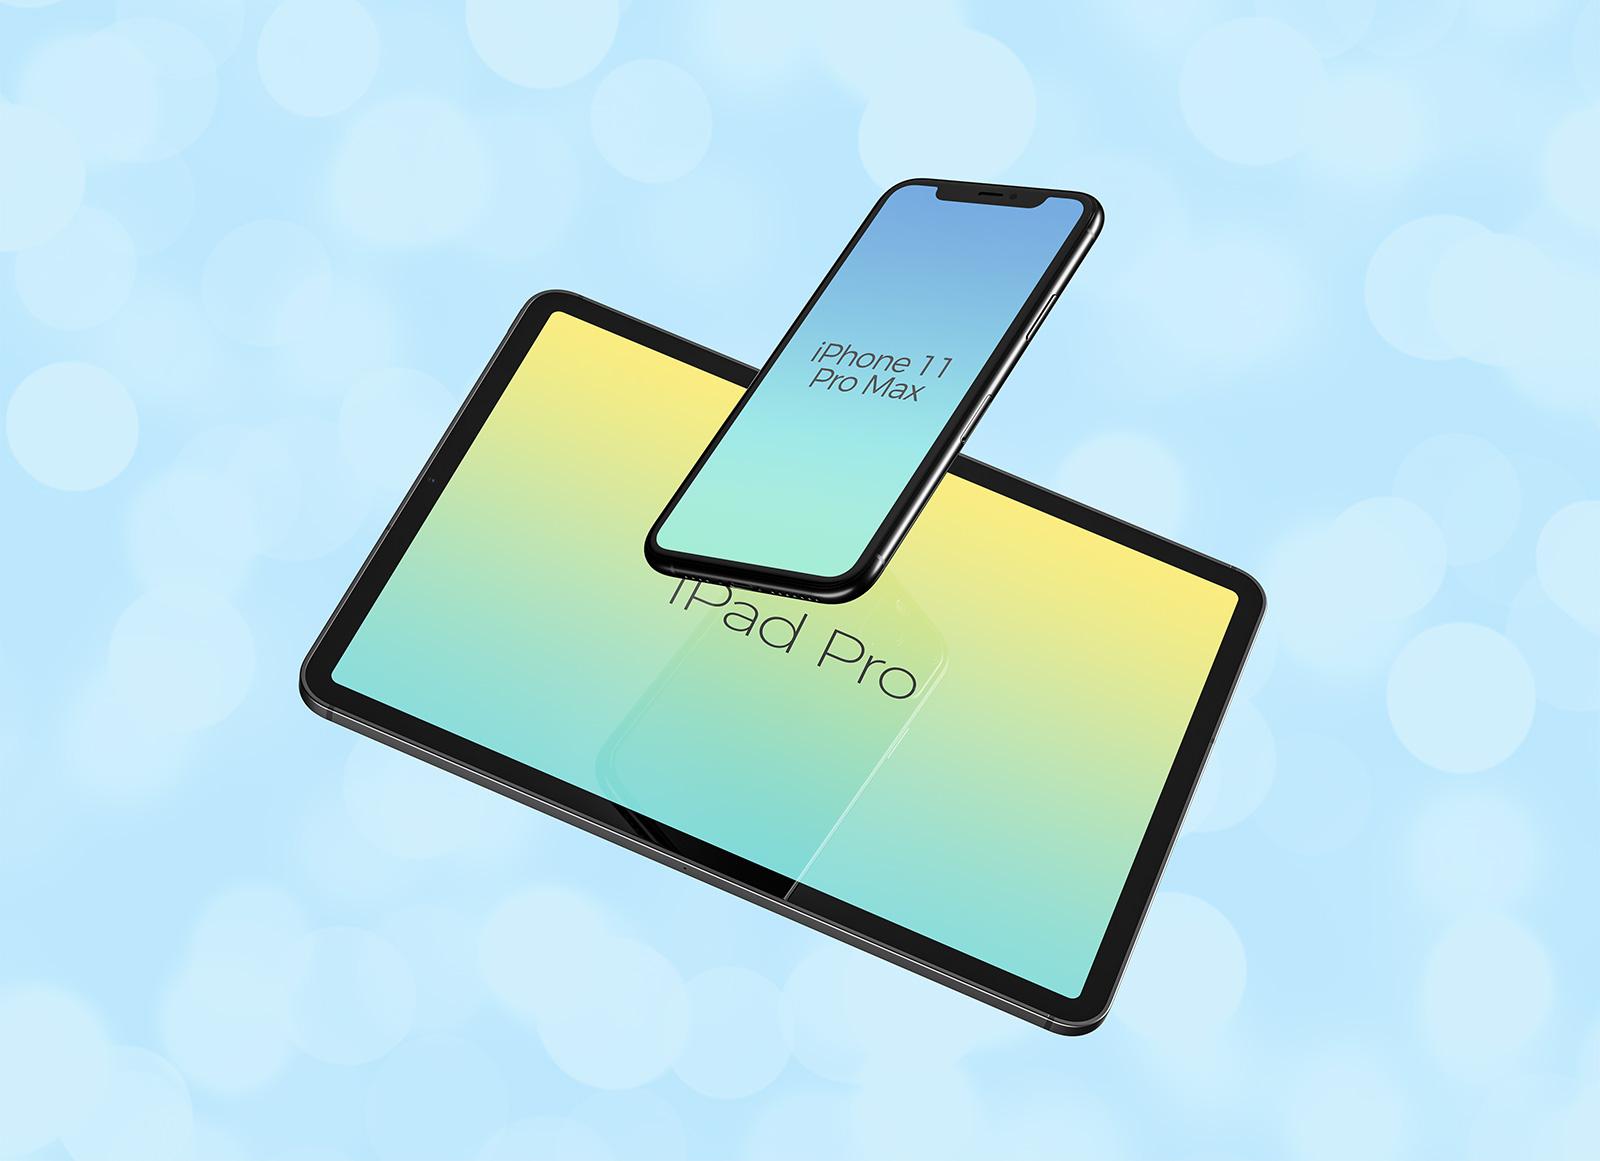 Free-Floating-iPhone-11-Pro-Max-&-iPad-Pro-Mockup-PSD